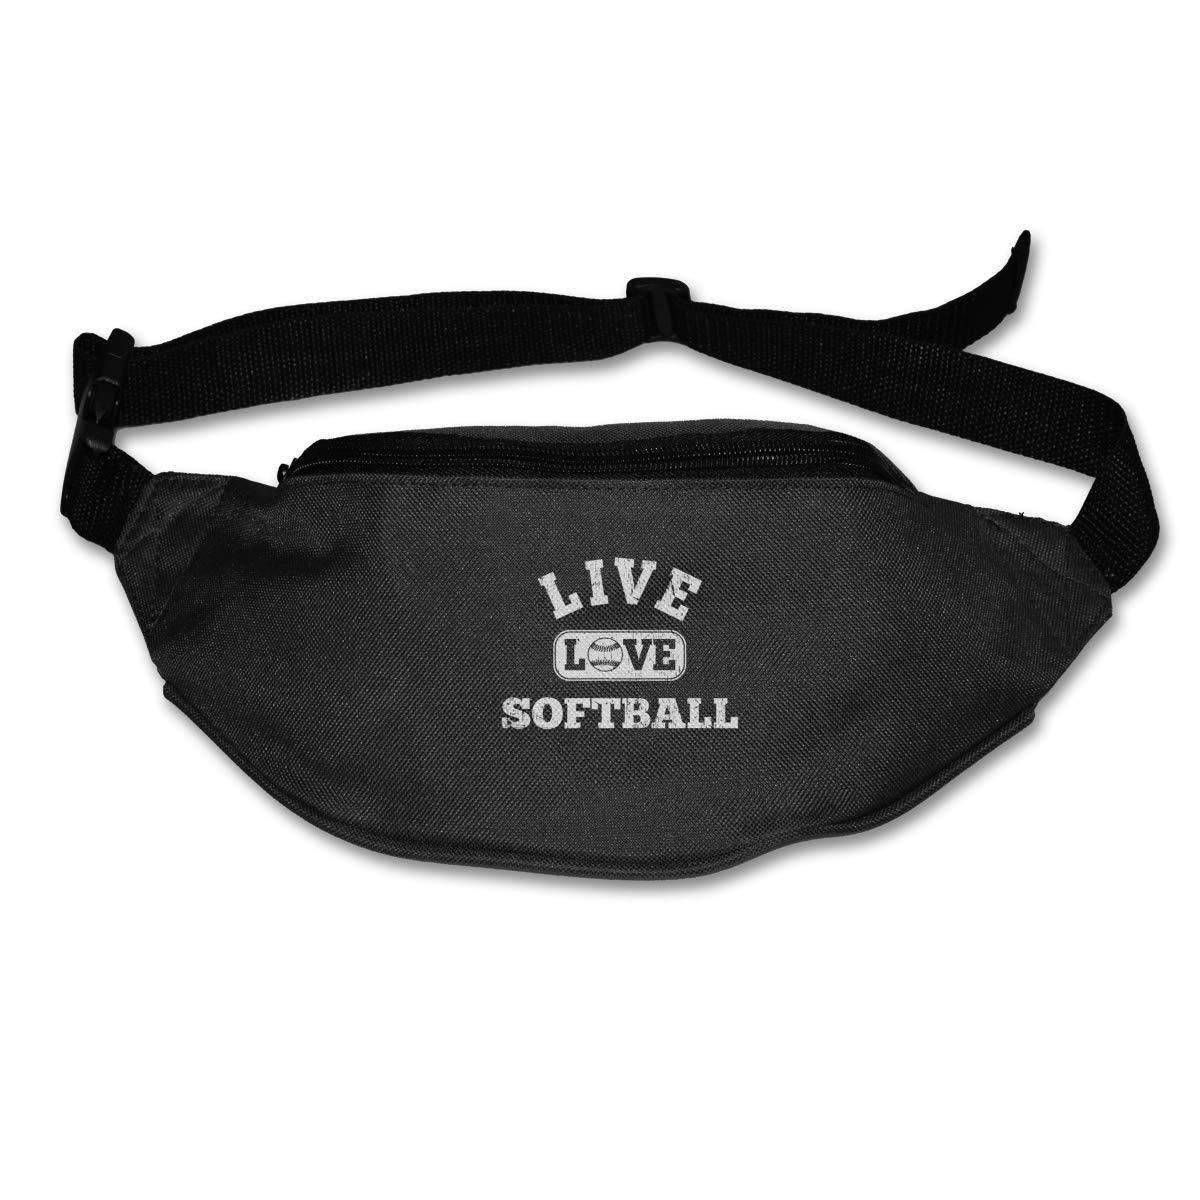 Live Love Softball Sport Waist Packs Fanny Pack Adjustable For Hike